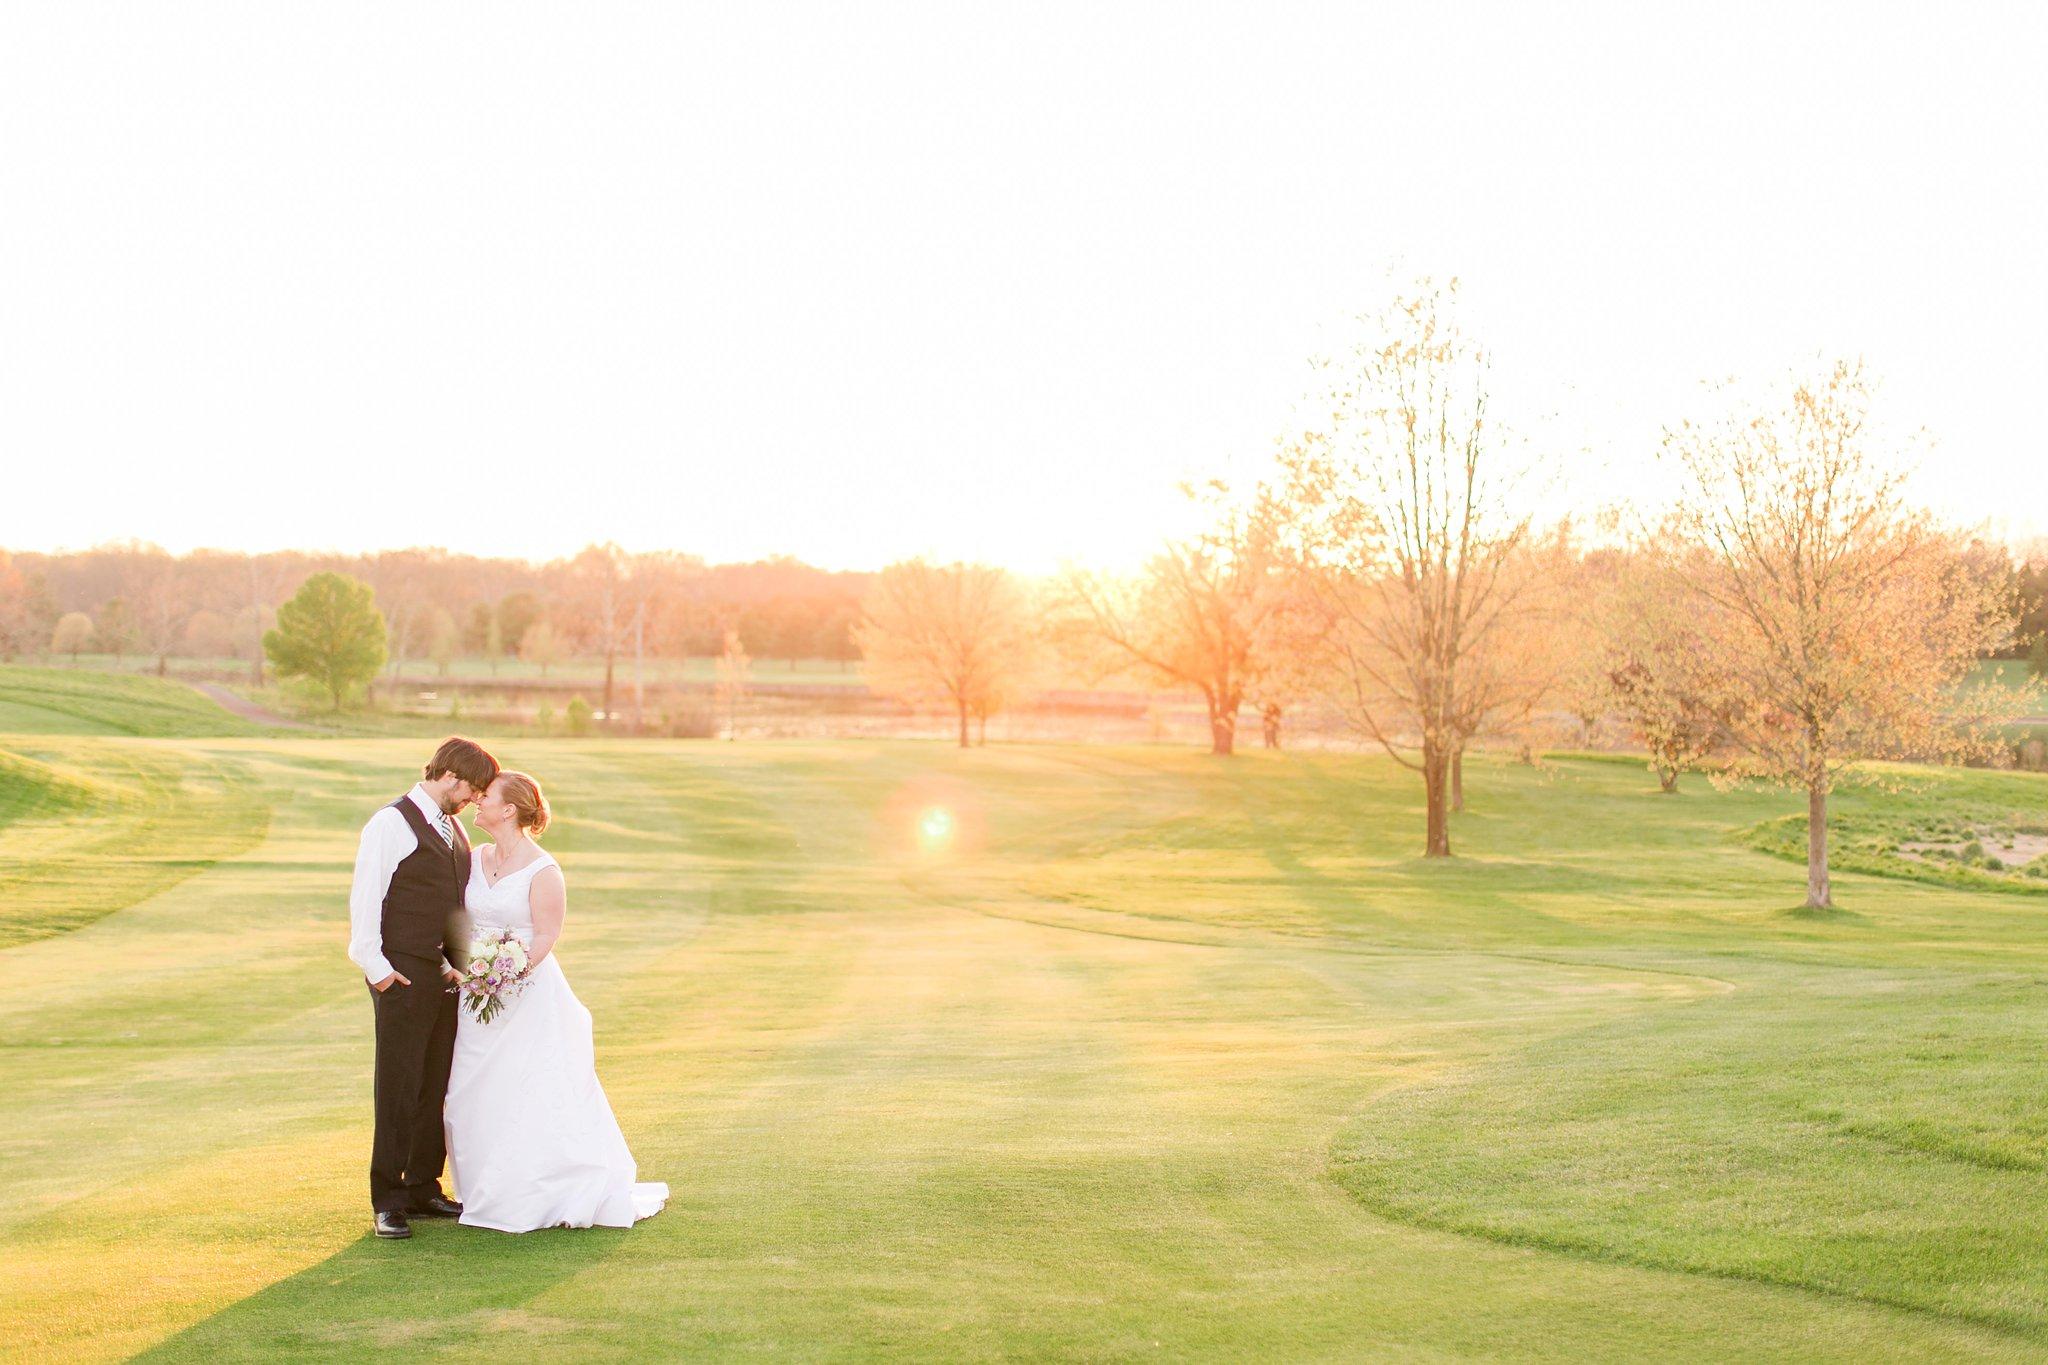 Chantilly National Golf Club Wedding Photos Virginia Wedding Photographer Megan Kelsey Photography Mary Beth and Nathan-118.jpg